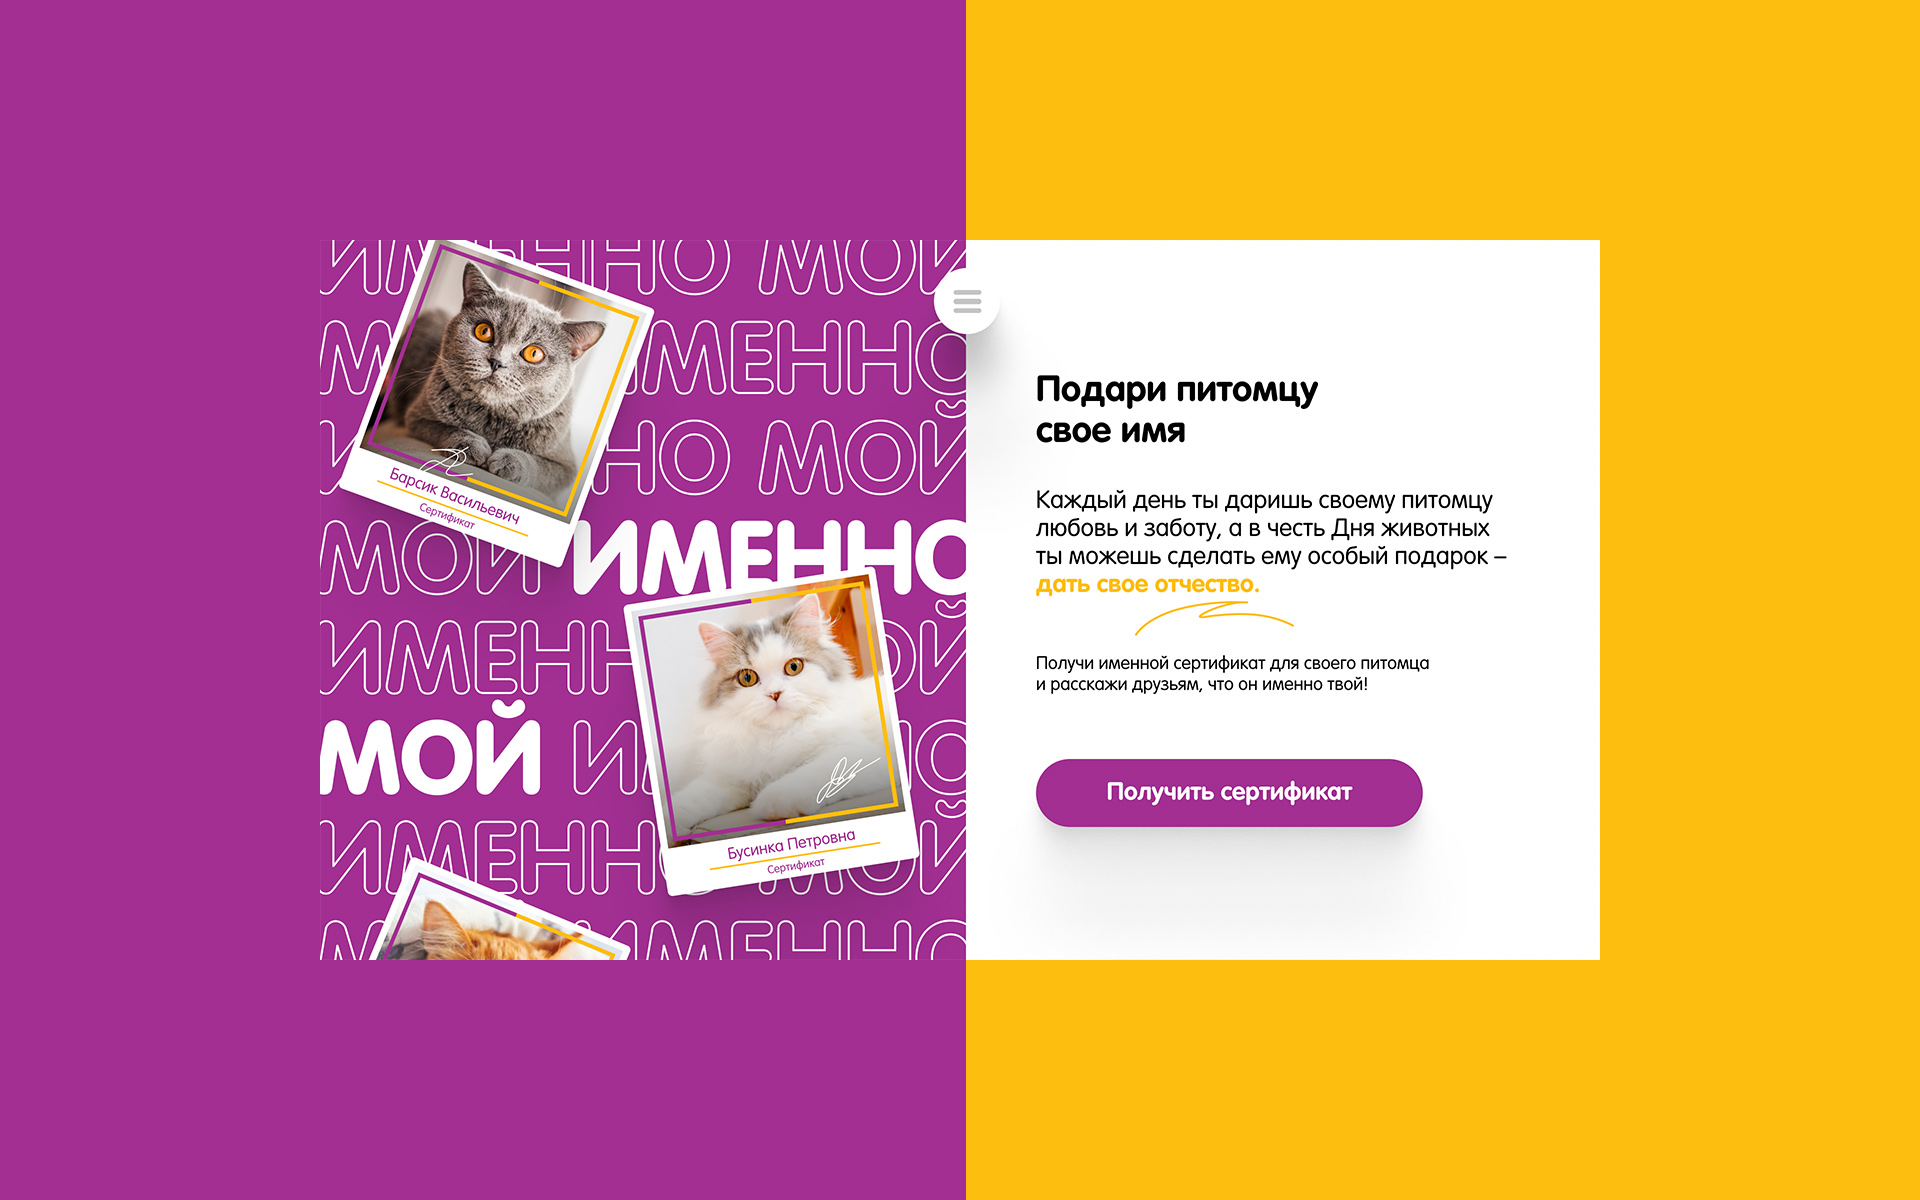 whiskas pedigree website